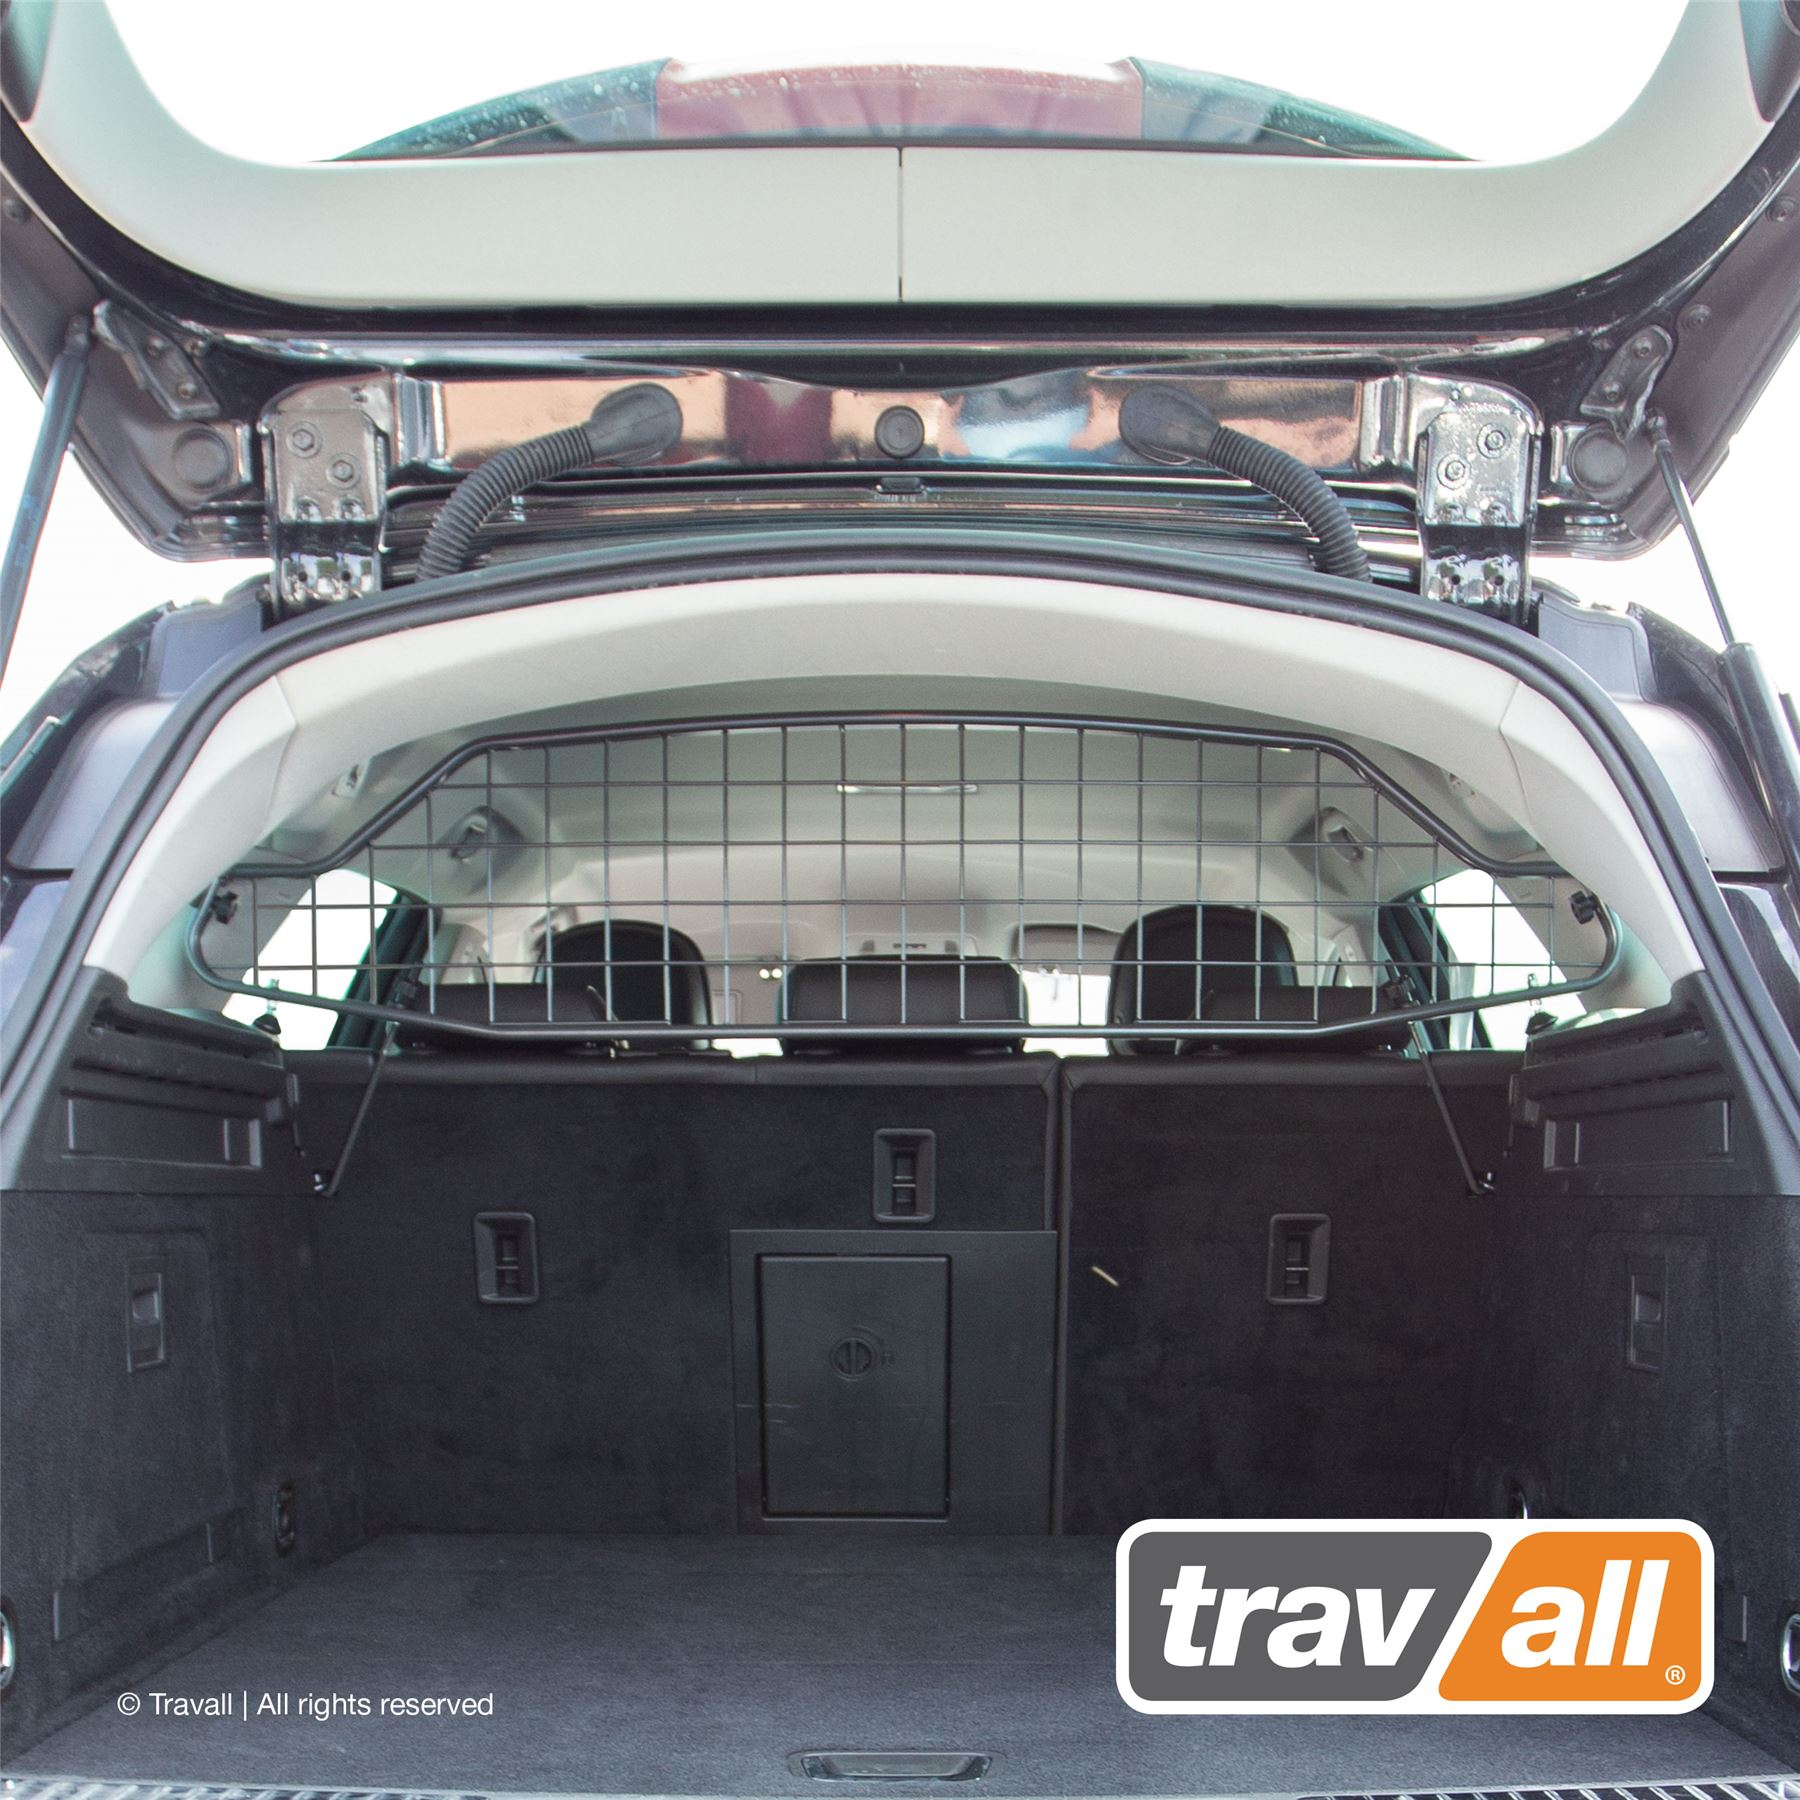 Opel // Vauxhall Insignia ST 2008-2017 no sunroof Travall® Dog Guard TDG1618